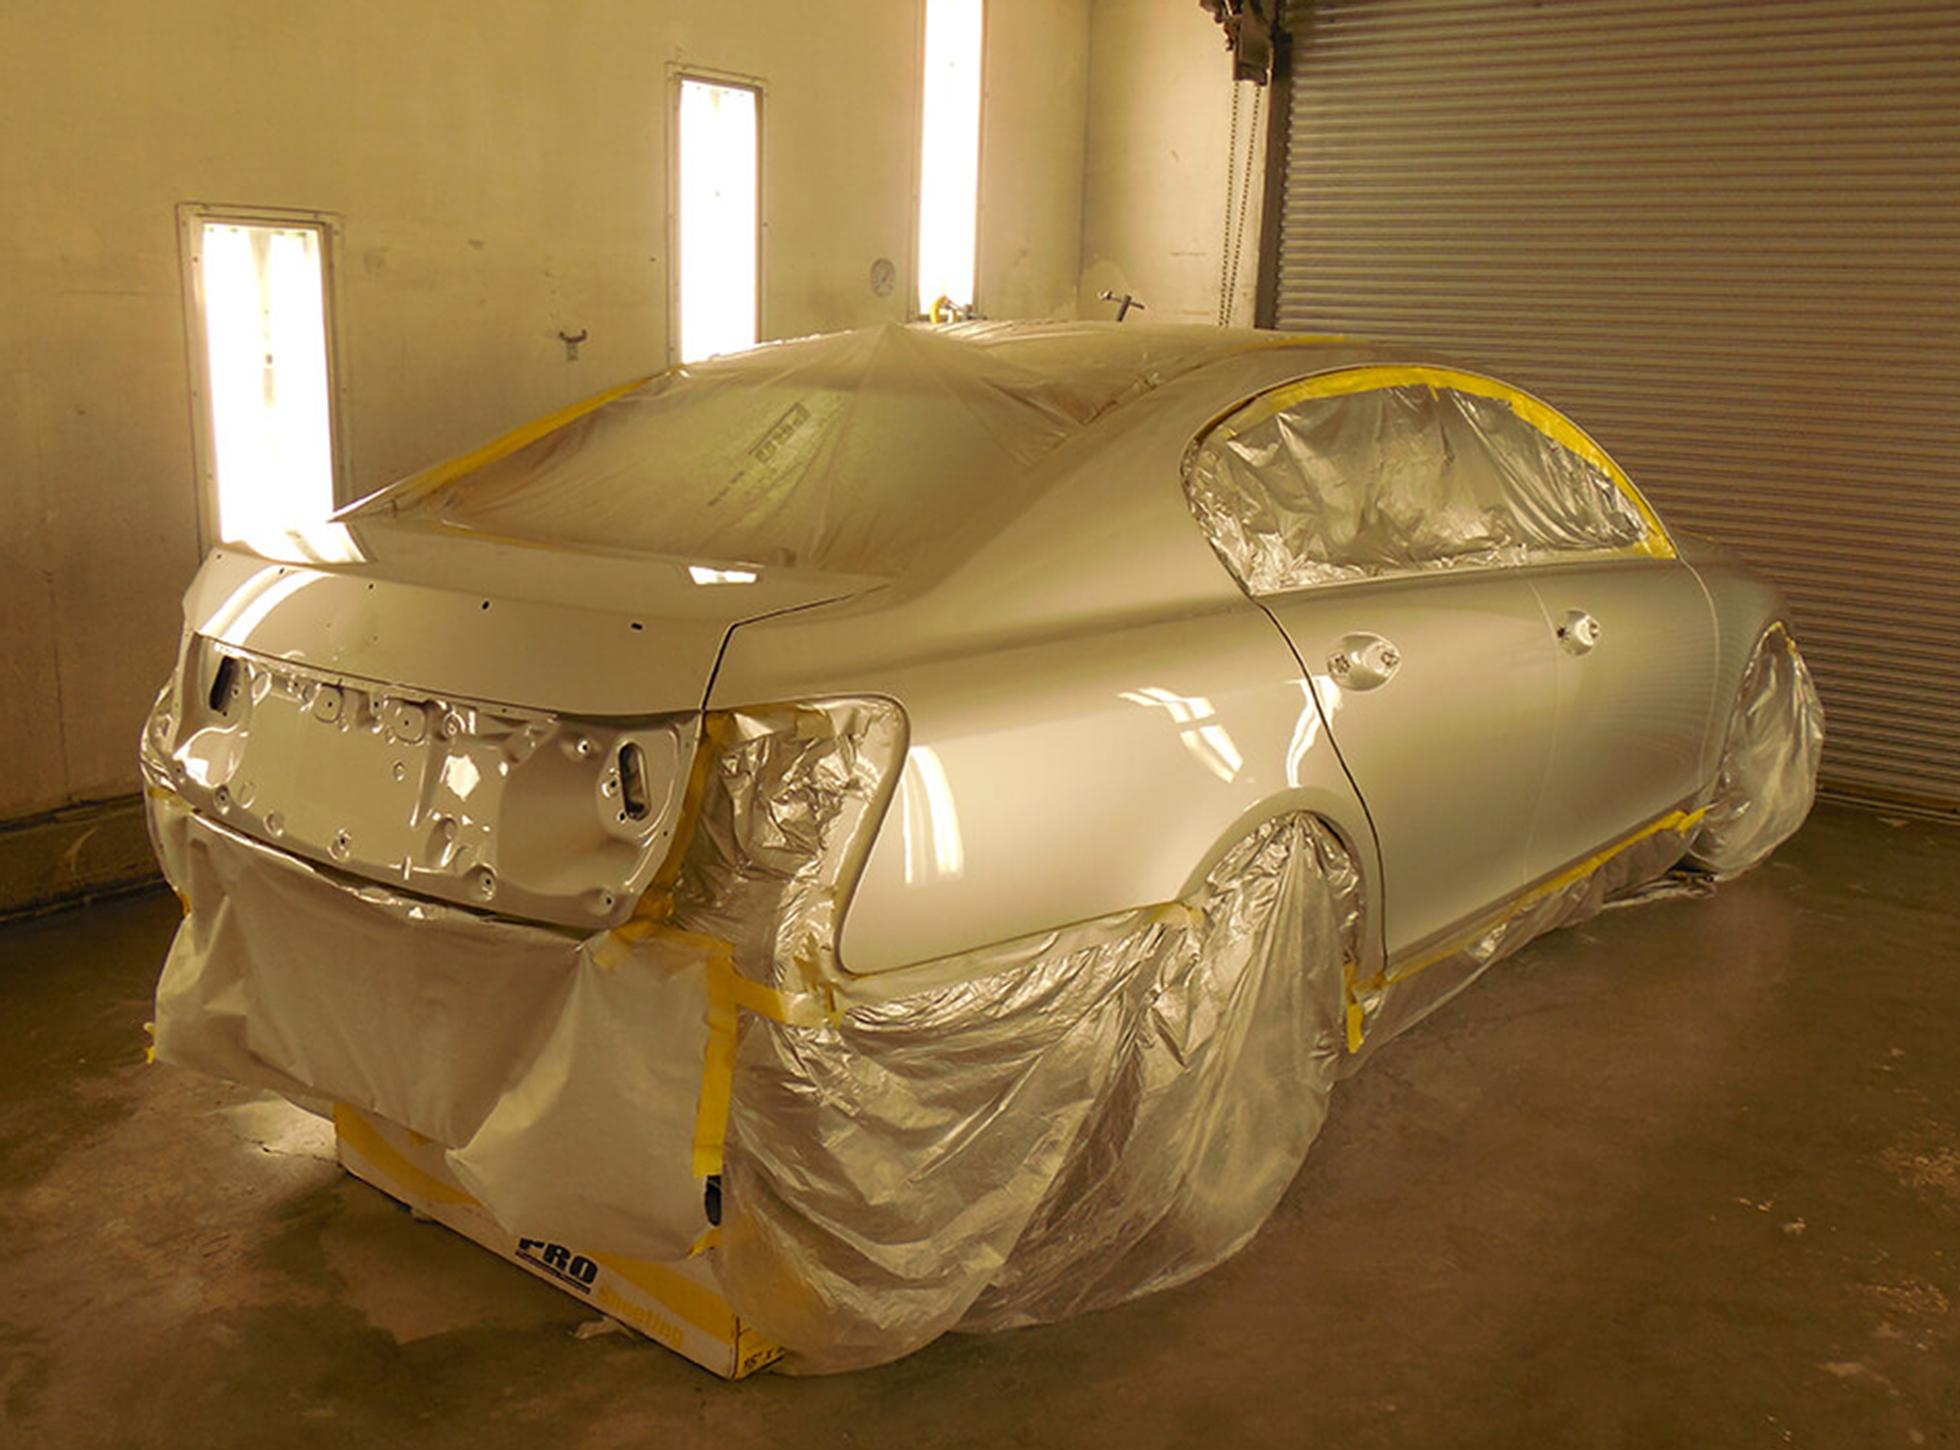 Auto-Buff-Auto-Body-West-Seattle-collision-repair-paint-01.JPG